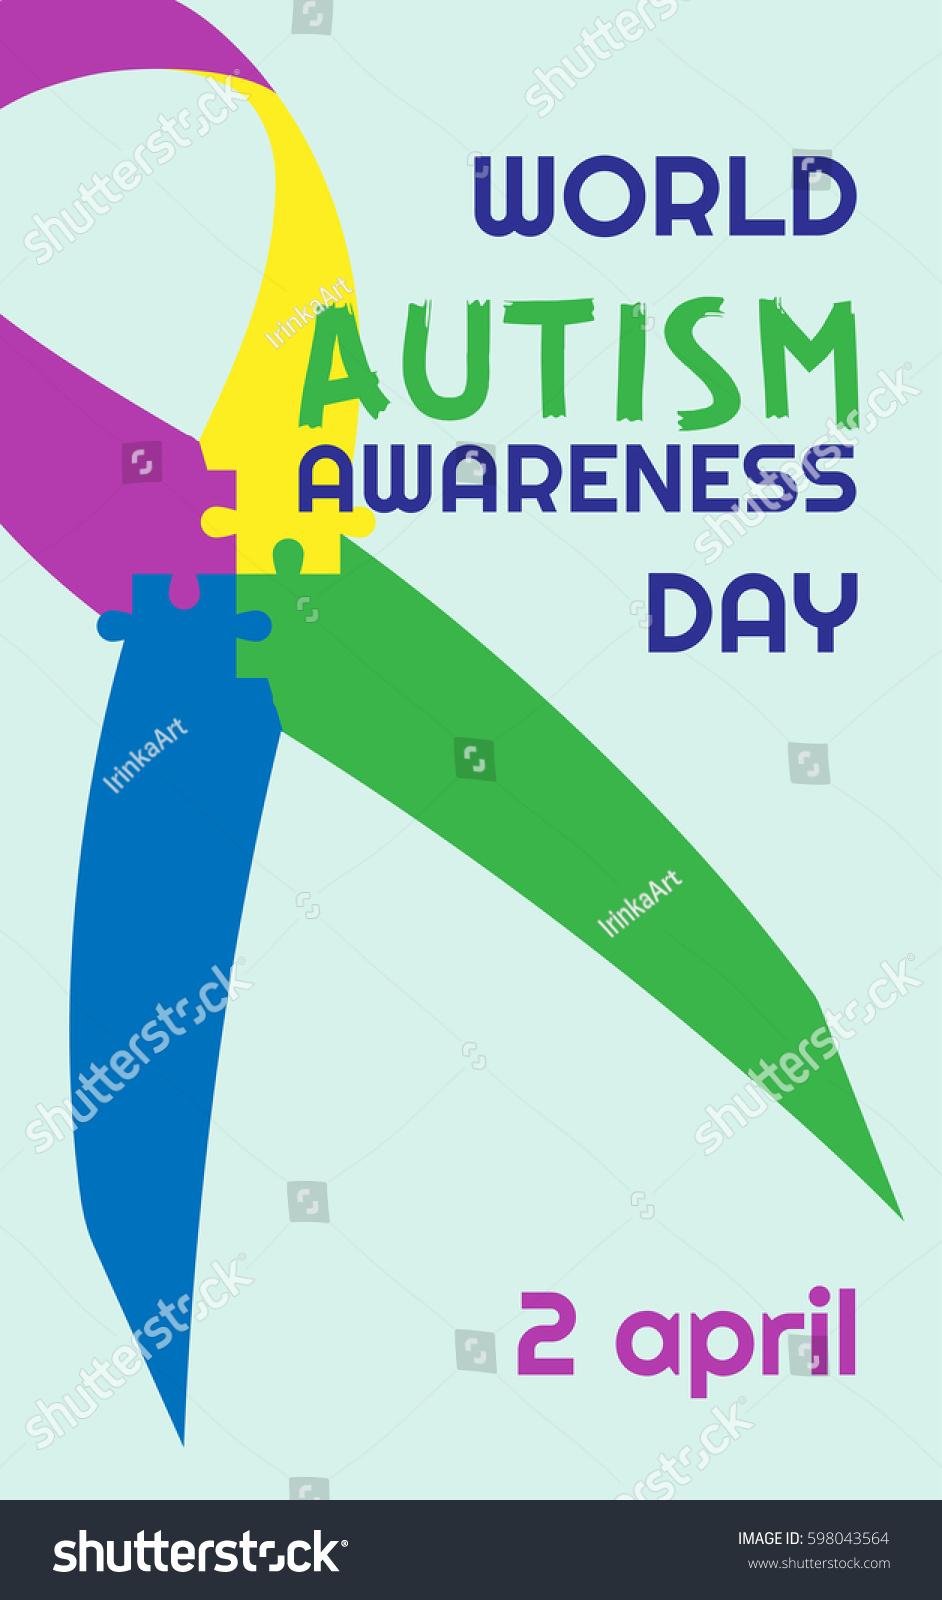 World autism awareness day ribbon puzzles stock vector 598043564 world autism awareness day ribbon puzzles vector colorful puzzles vector on tape symbol of biocorpaavc